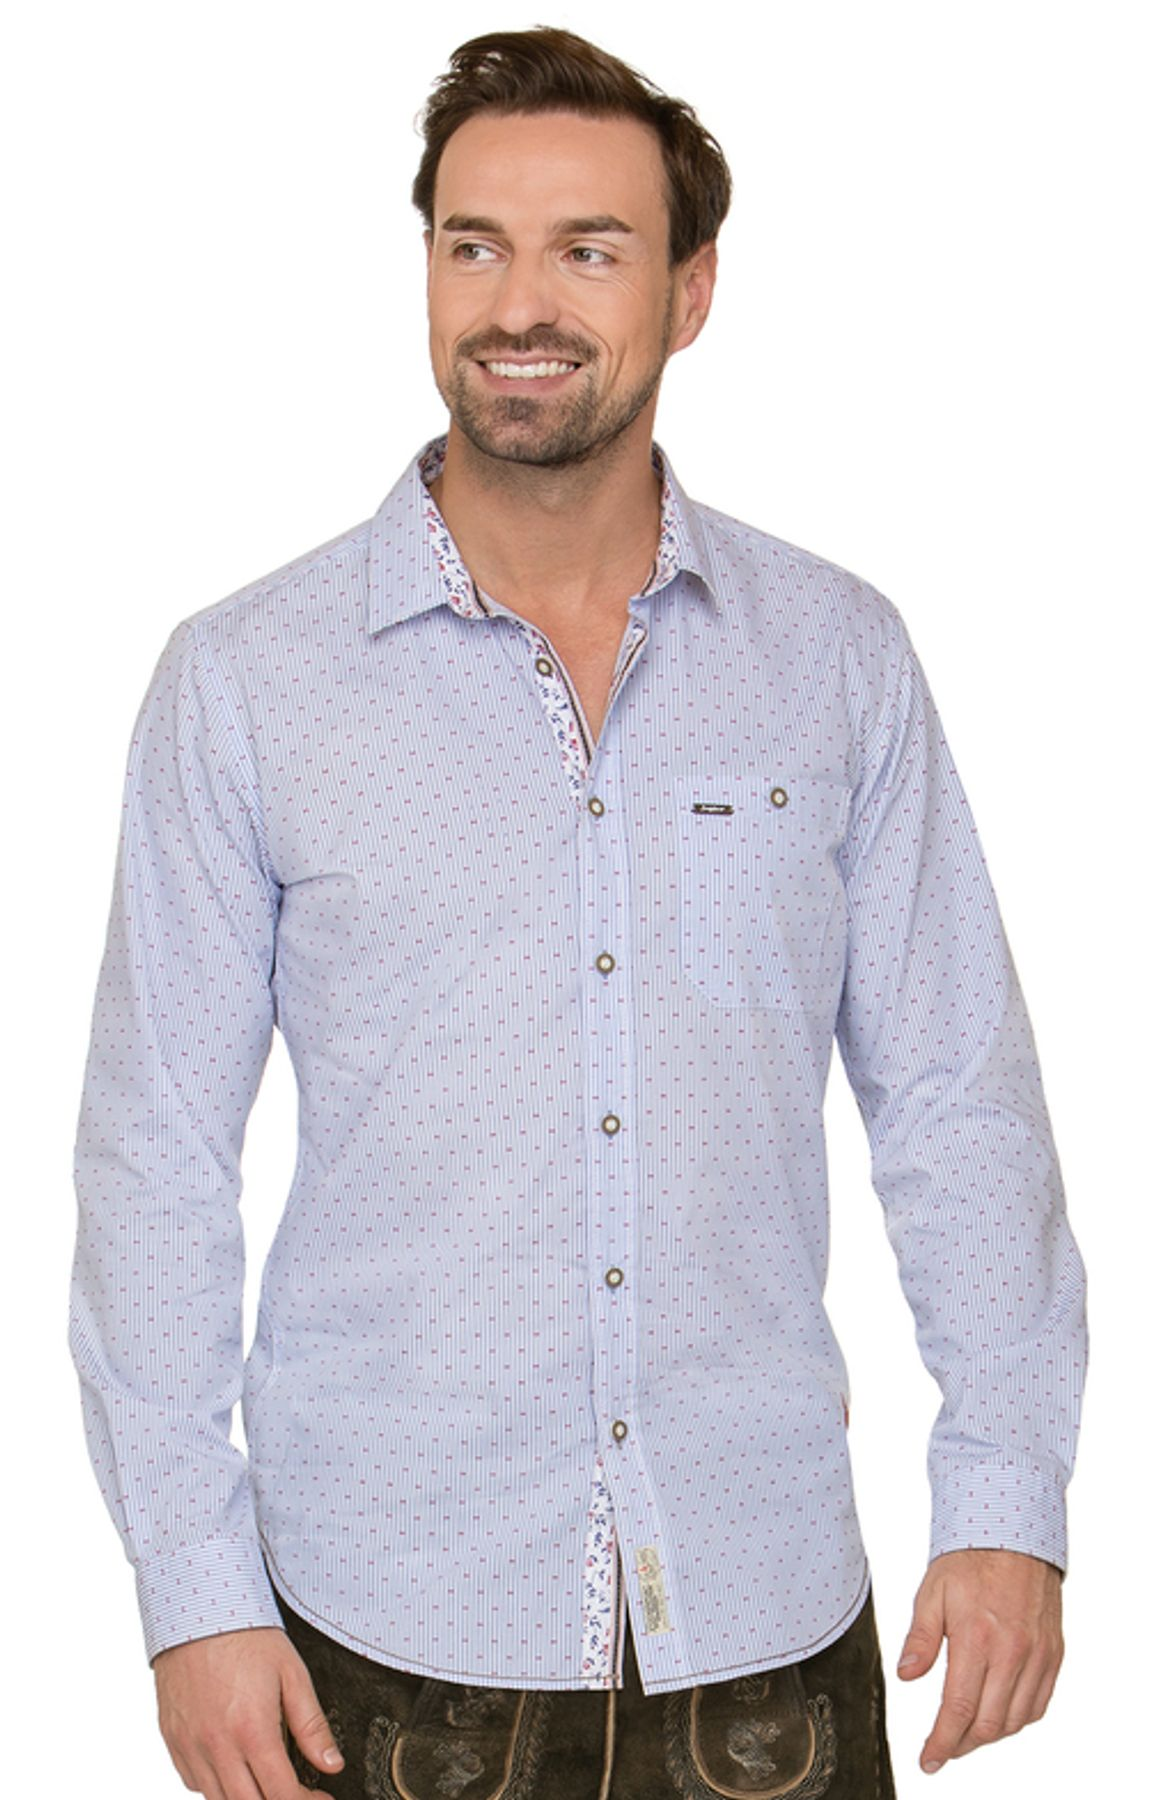 Stockerpoint - Herren Trachtenhemd in Hellblau, Kito – Bild 2